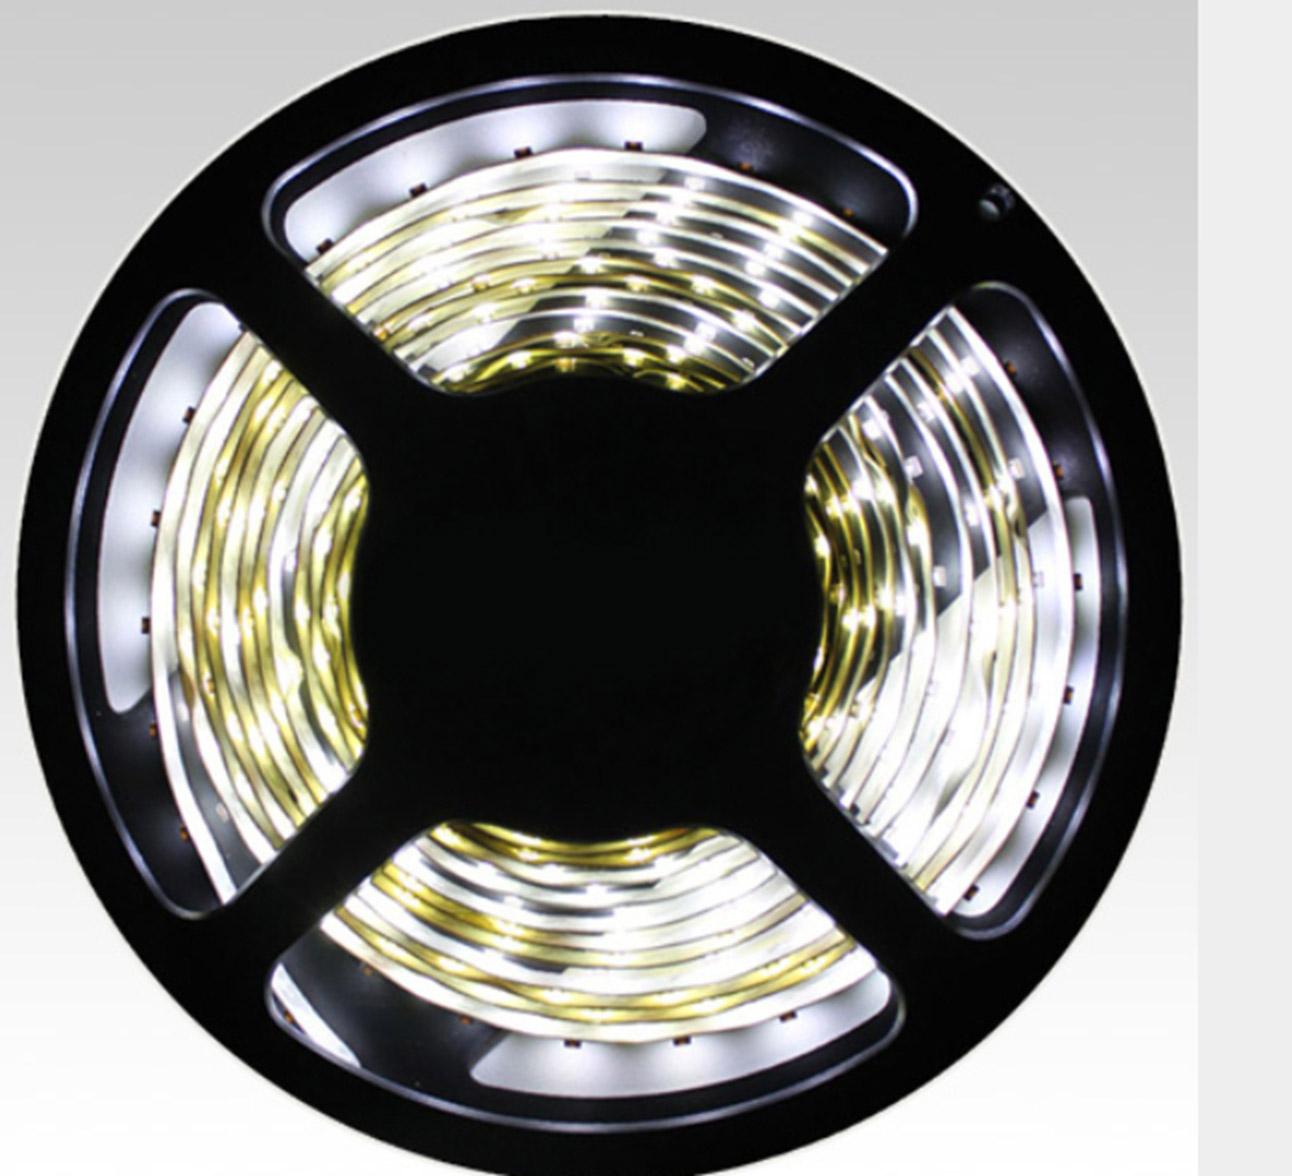 [EU Direct] Non-waterproof 5 m 300LED 3528 bead white light tape